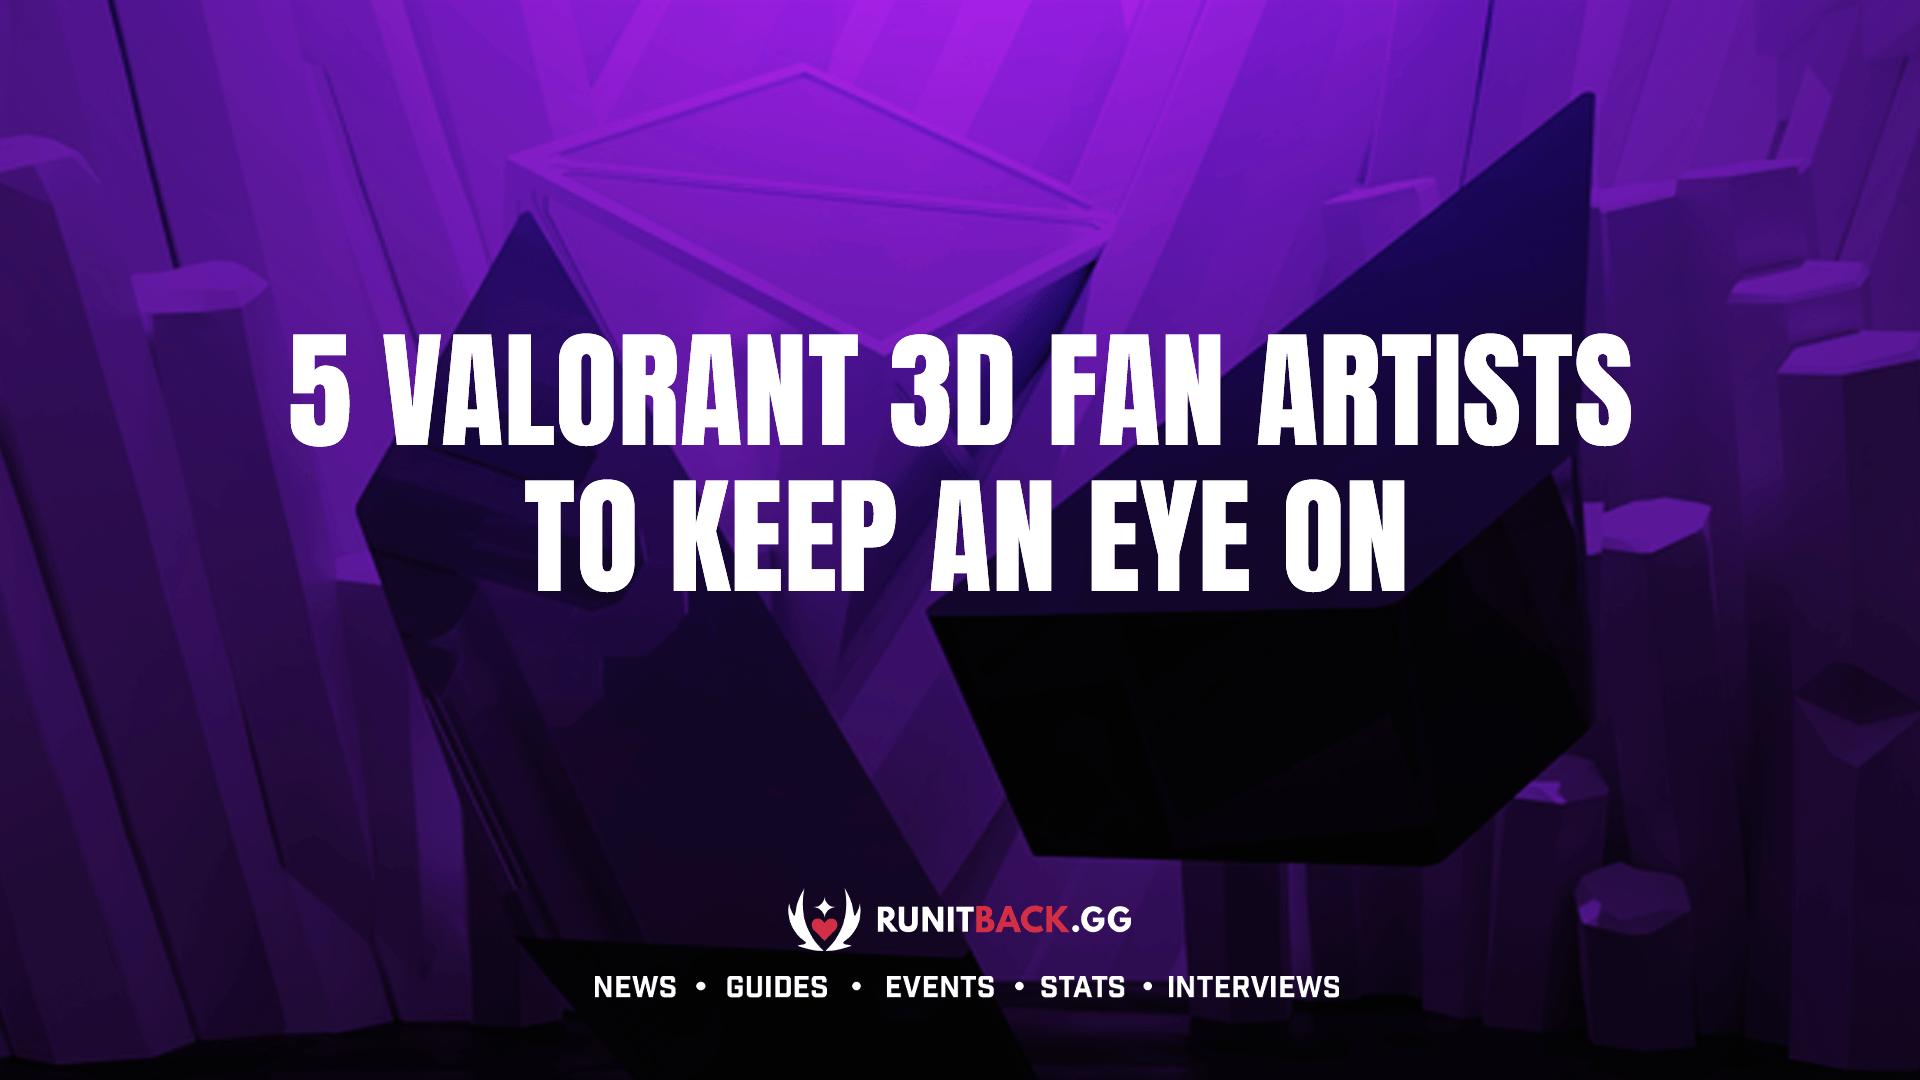 Community Spotlight: 5 VALORANT 3D Fan Artists to Keep an Eye On